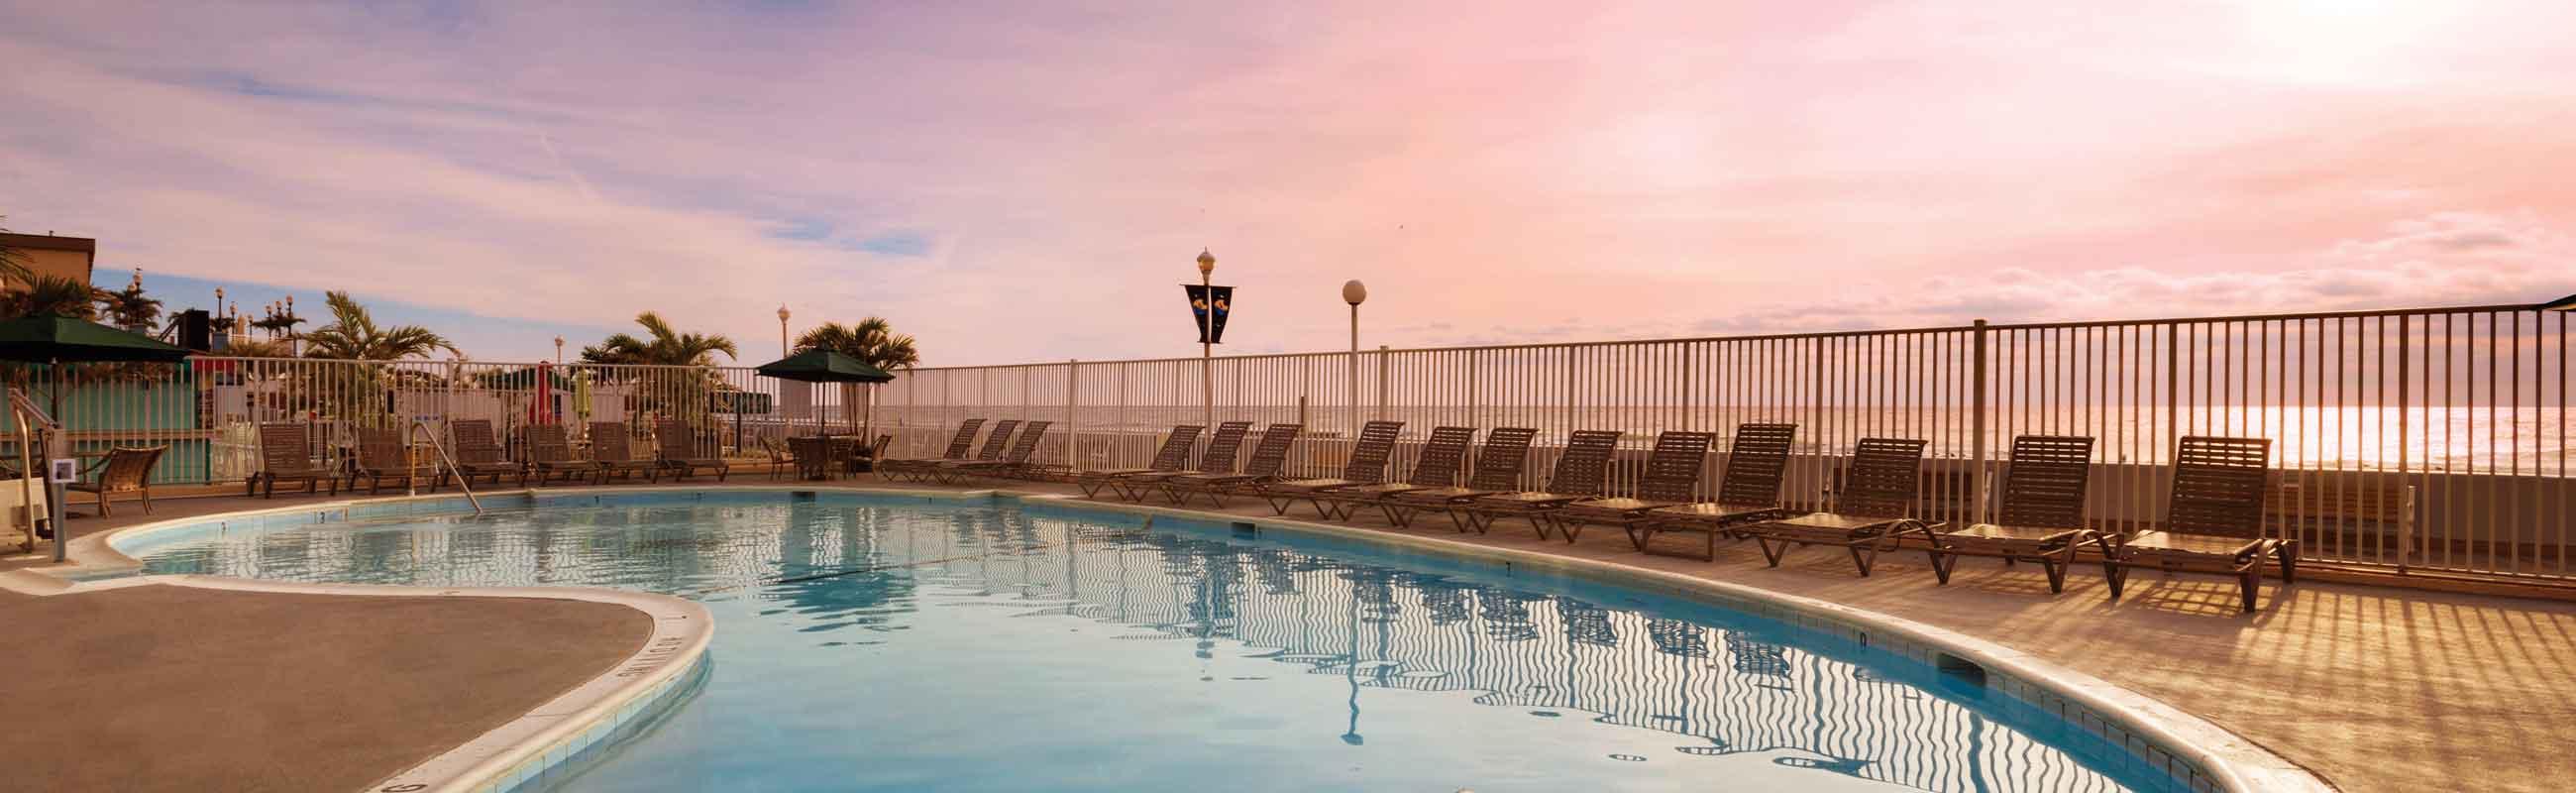 Hgs Meet Quality Inn Boardwalk